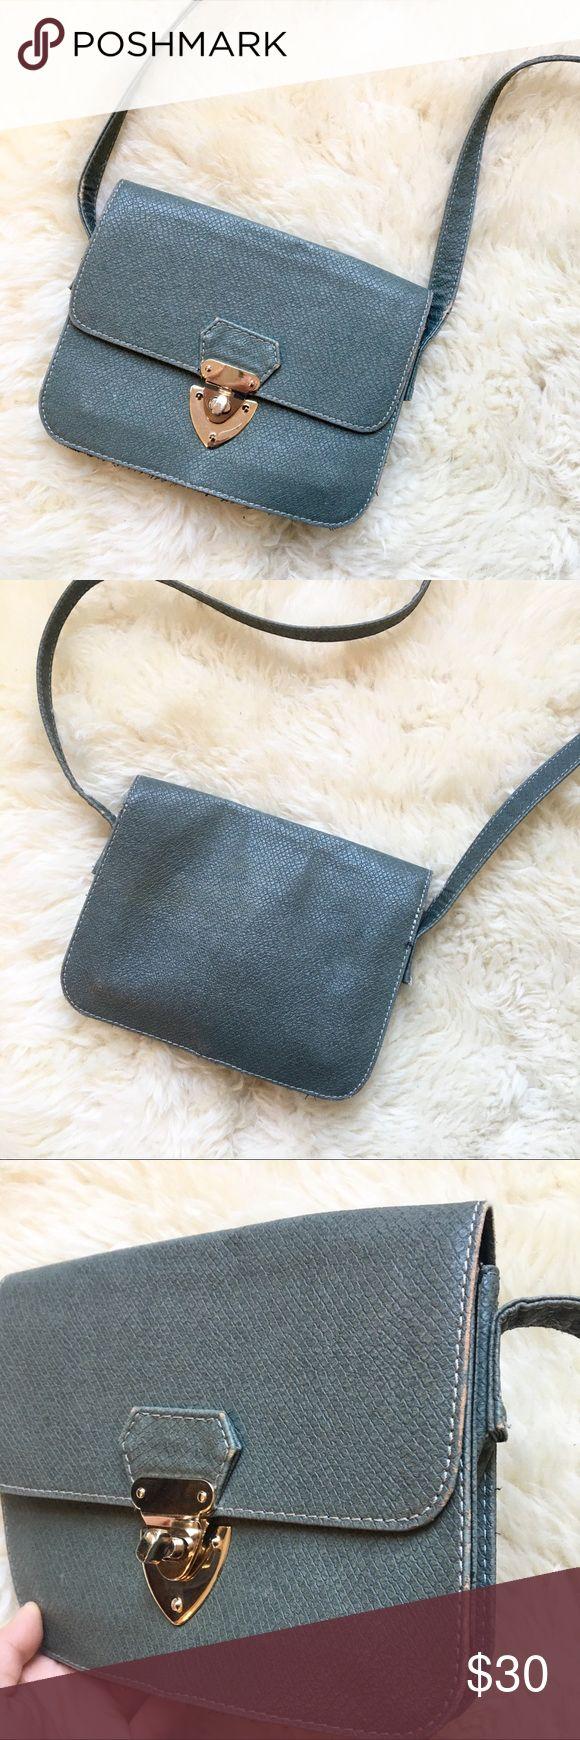 Brandy Melville Teal Bag Purchased in Madrid Brandy Melville. Brandy Melville Bags